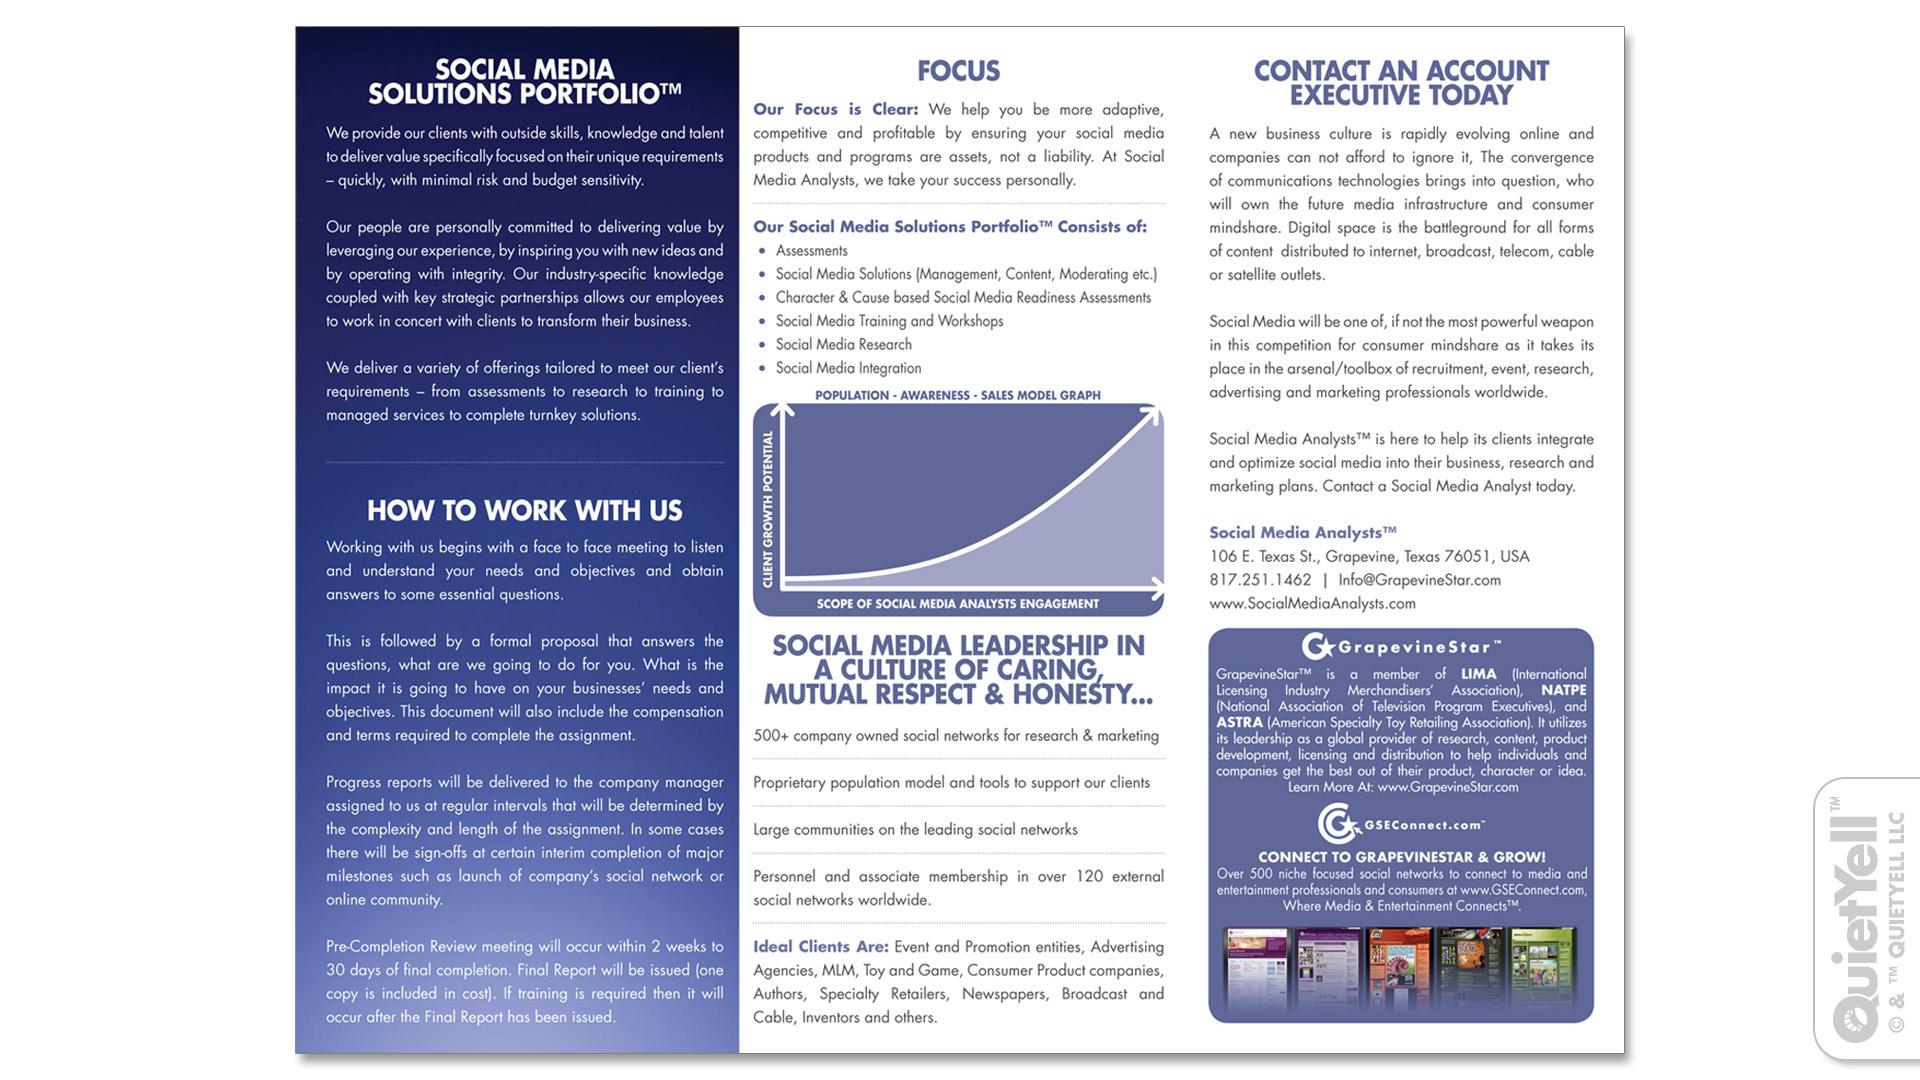 quietyell_design_details_socialmediaanalysts_trifold_1_02